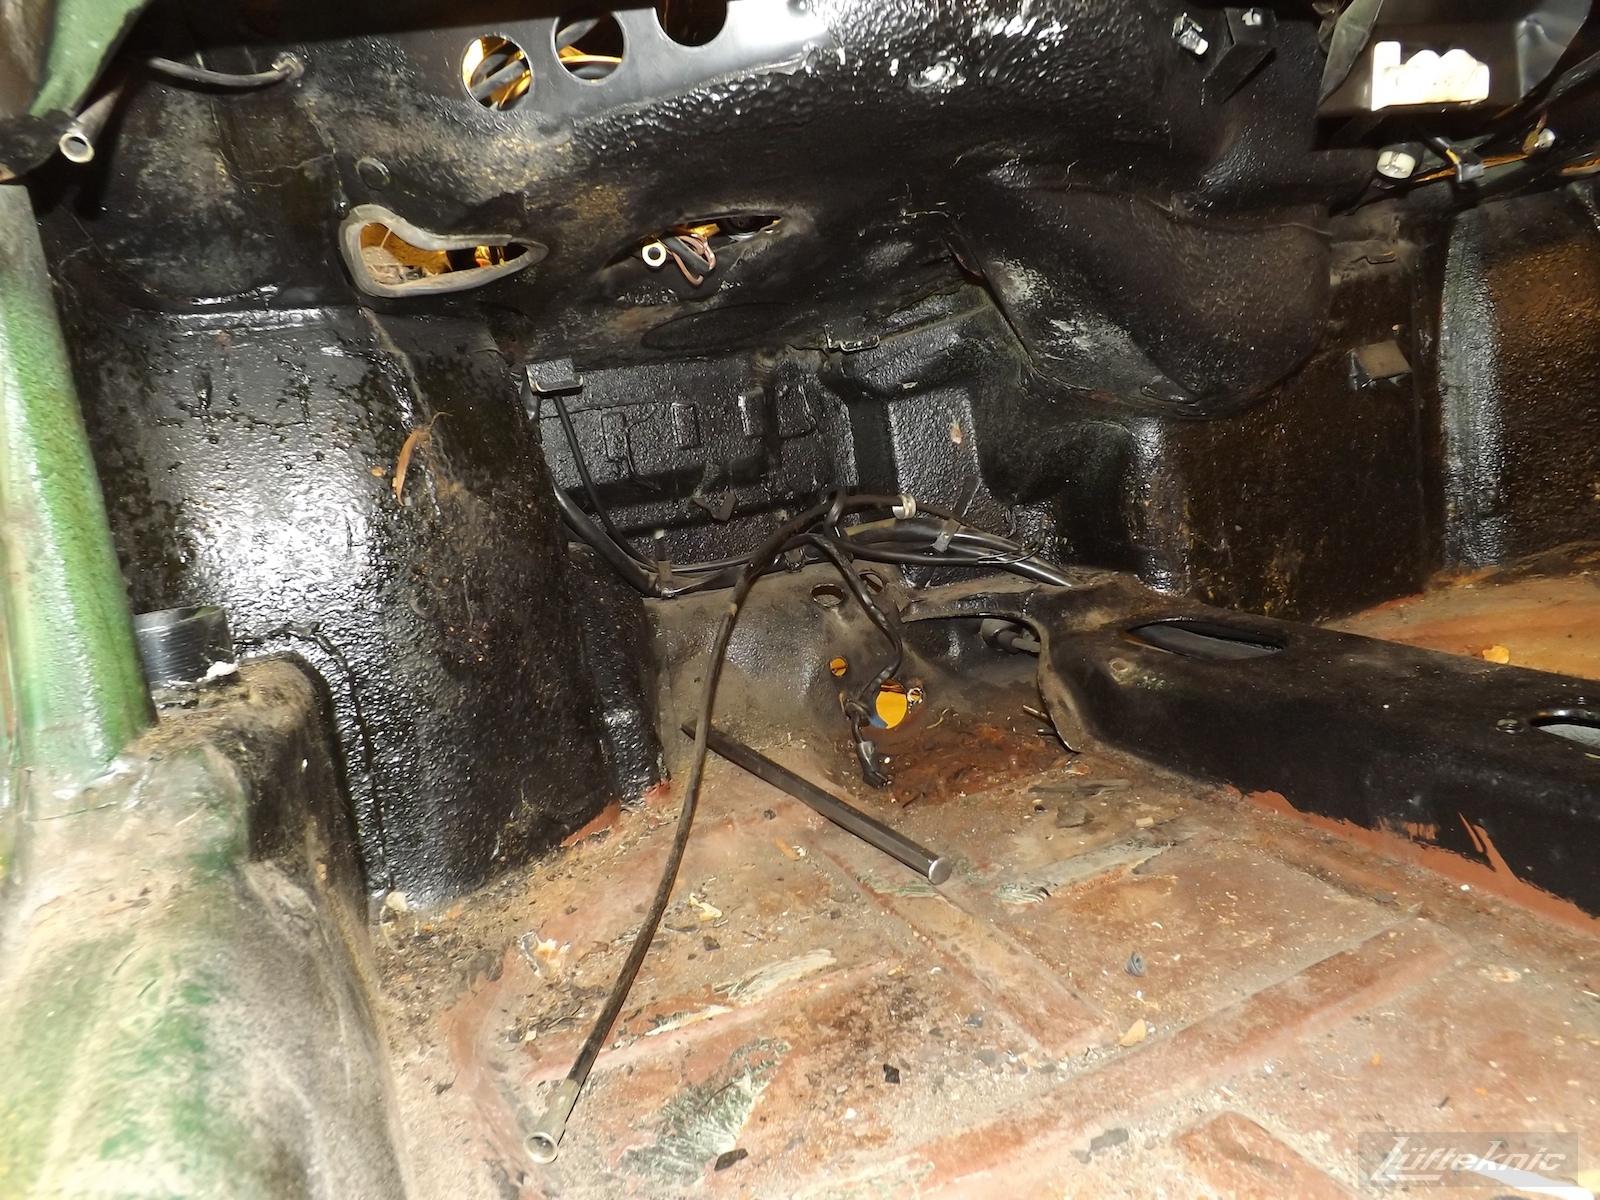 Floor boards and pedal box area on an Irish Green Porsche 912 undergoing restoration at Lufteknic.